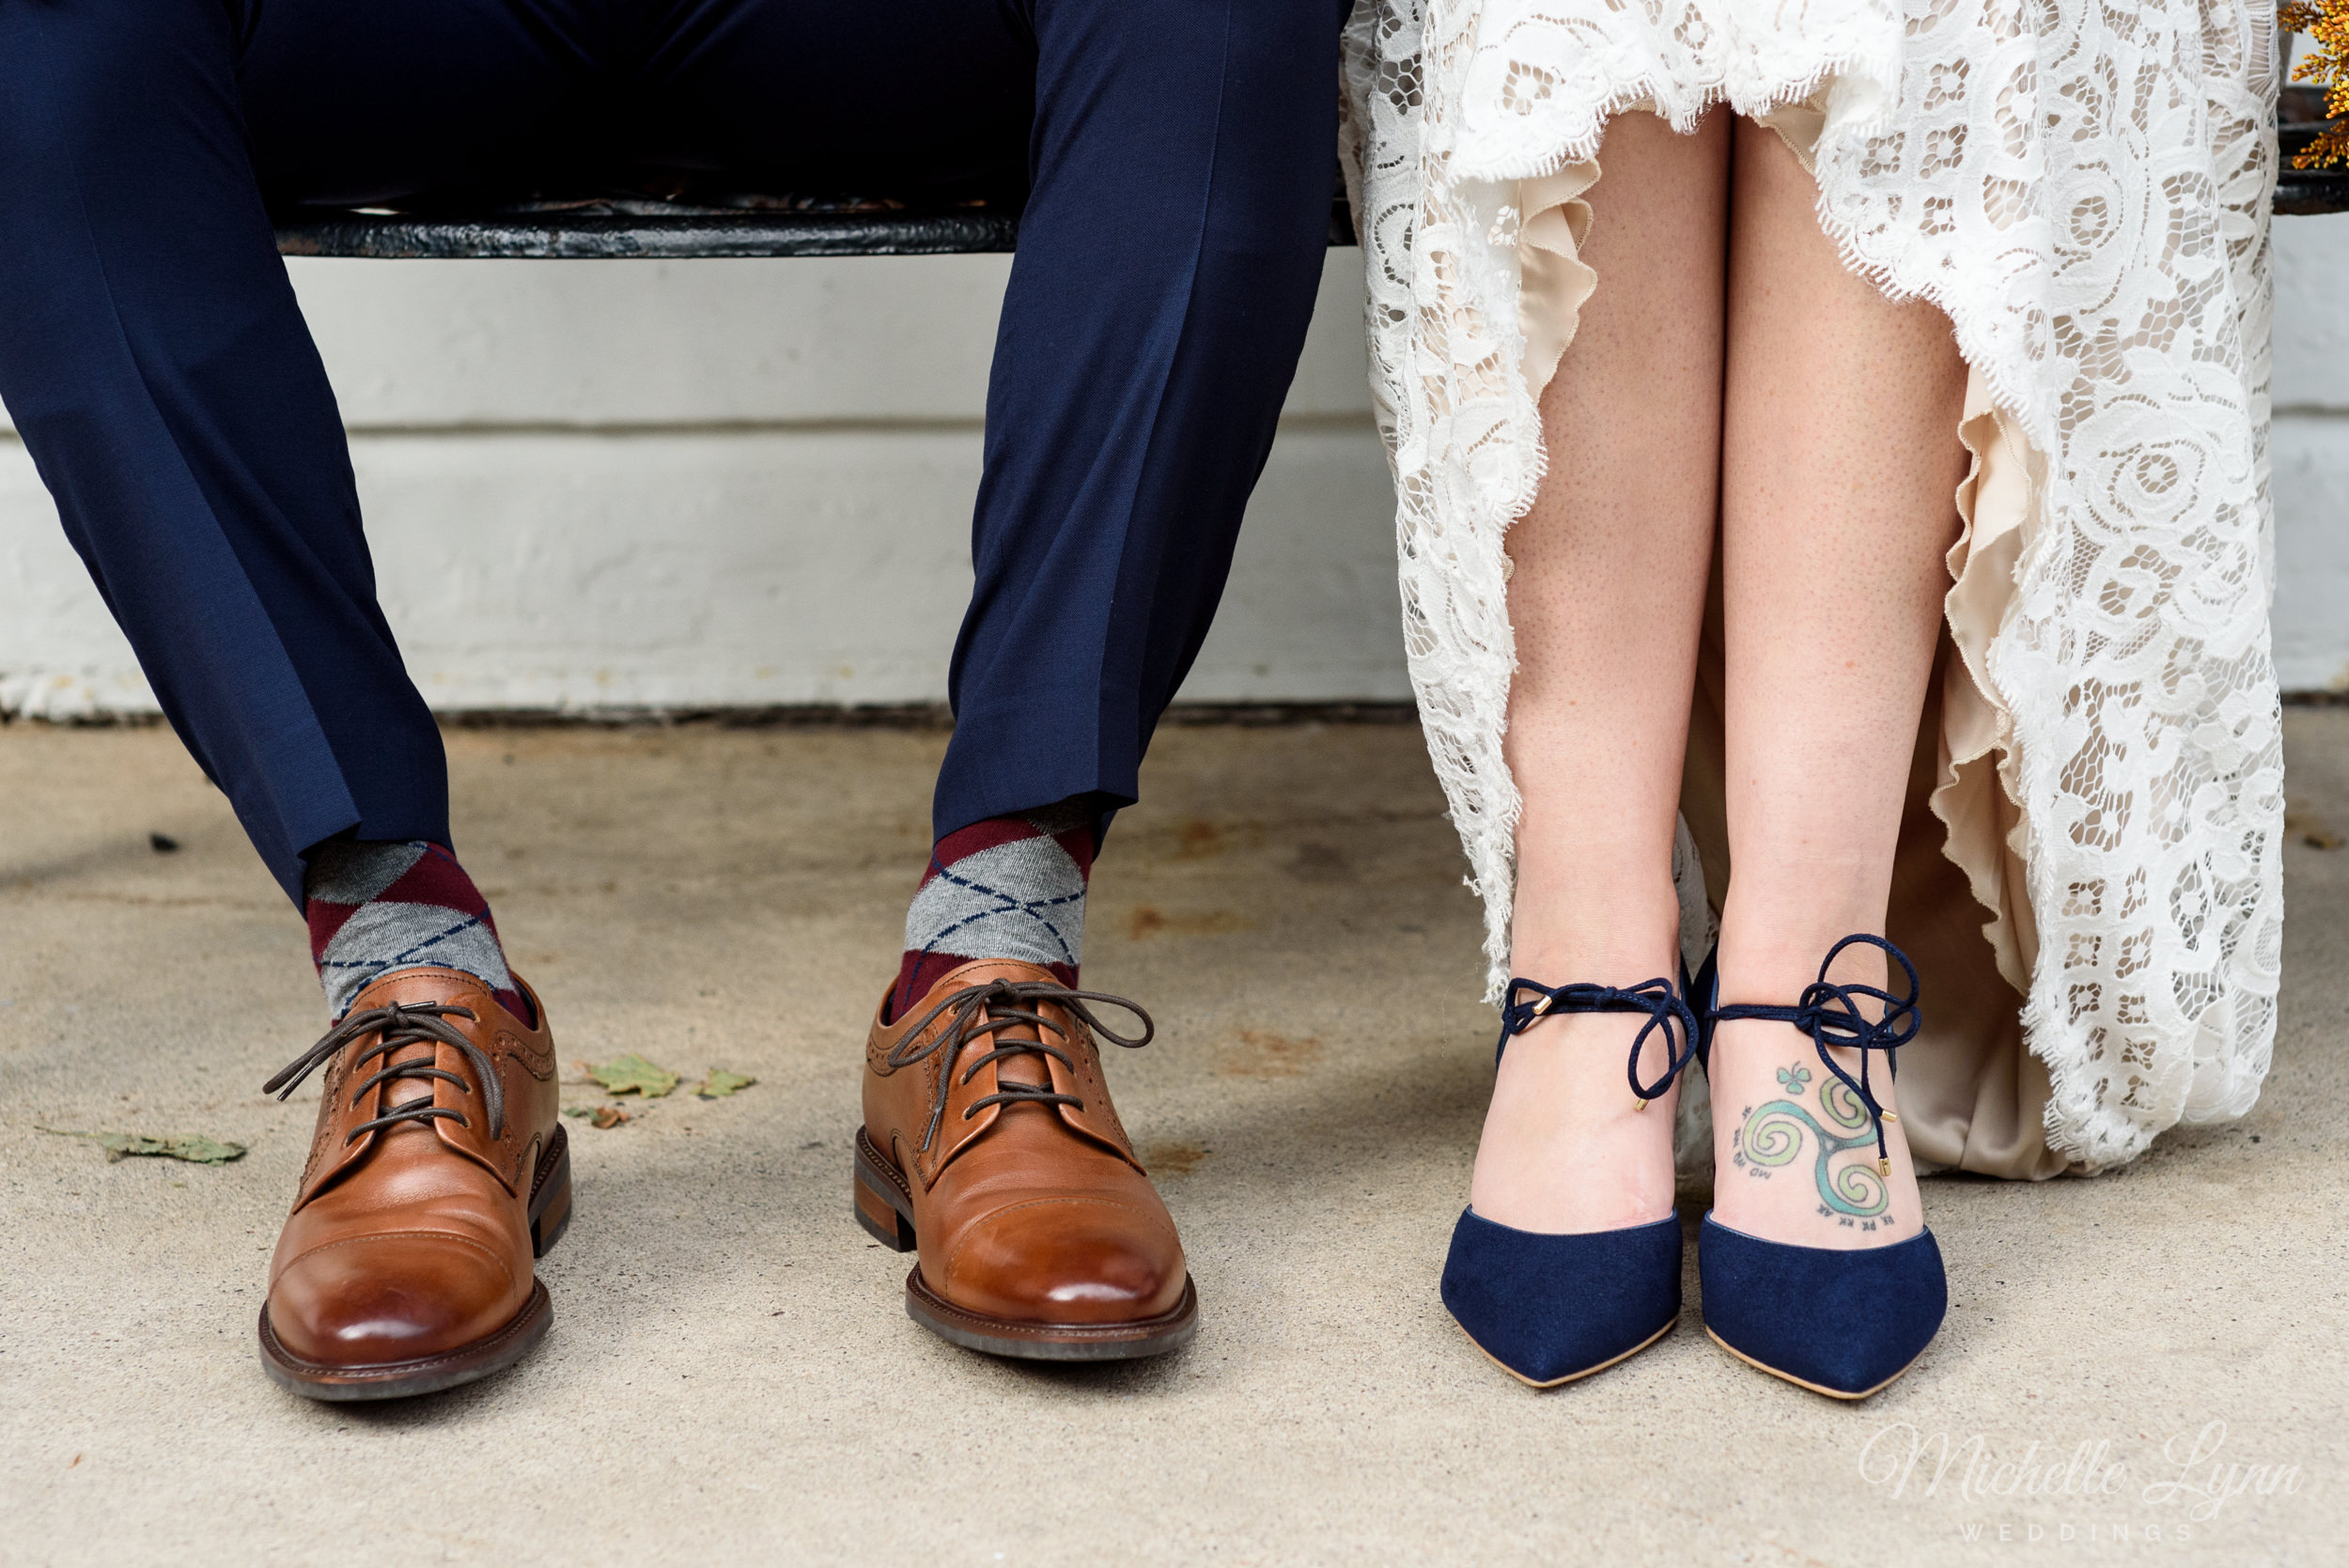 mlw-lumberville-general-store-new-hope-wedding-photographer-31.jpg